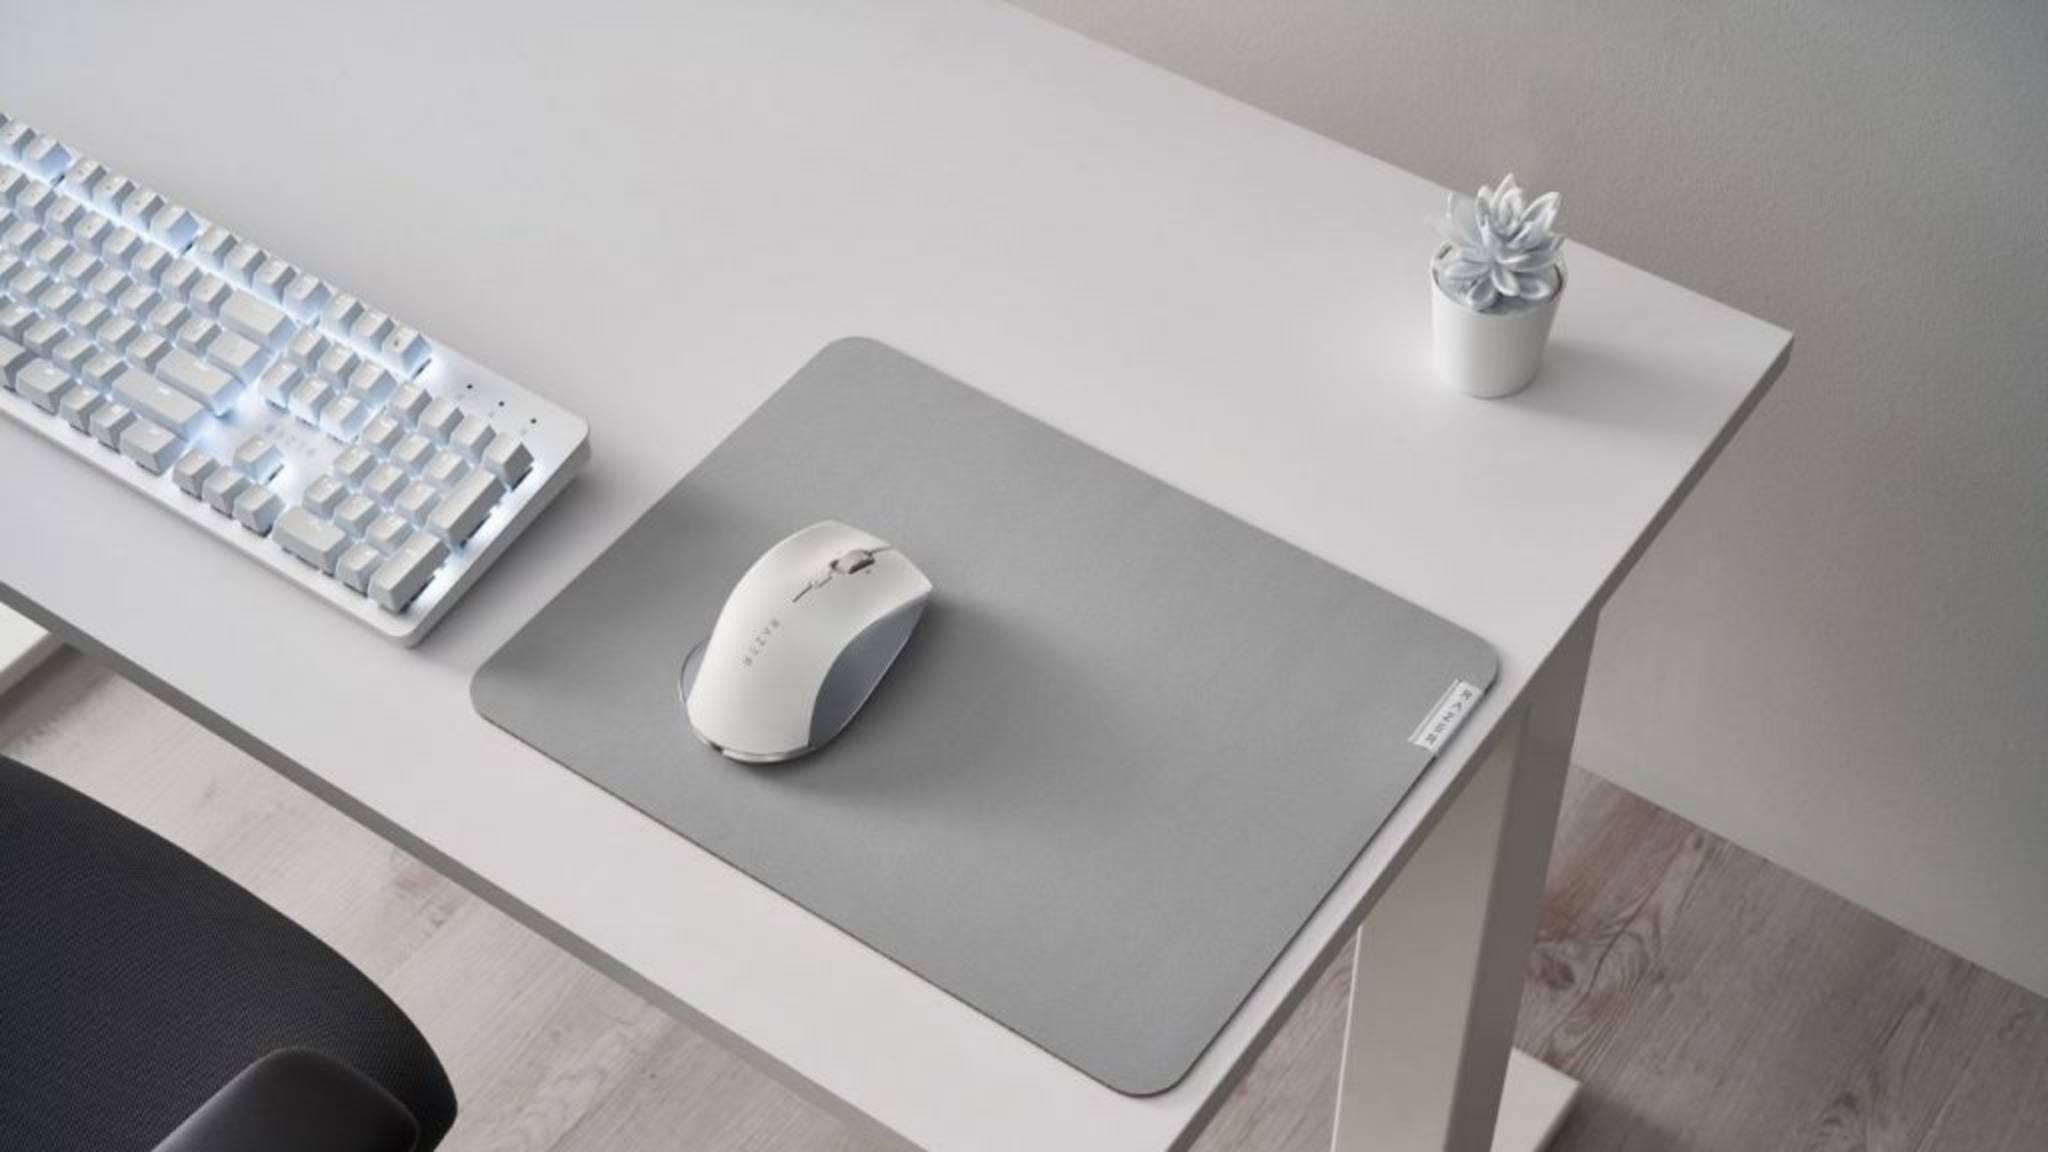 razer-office-pro-click-type-glide